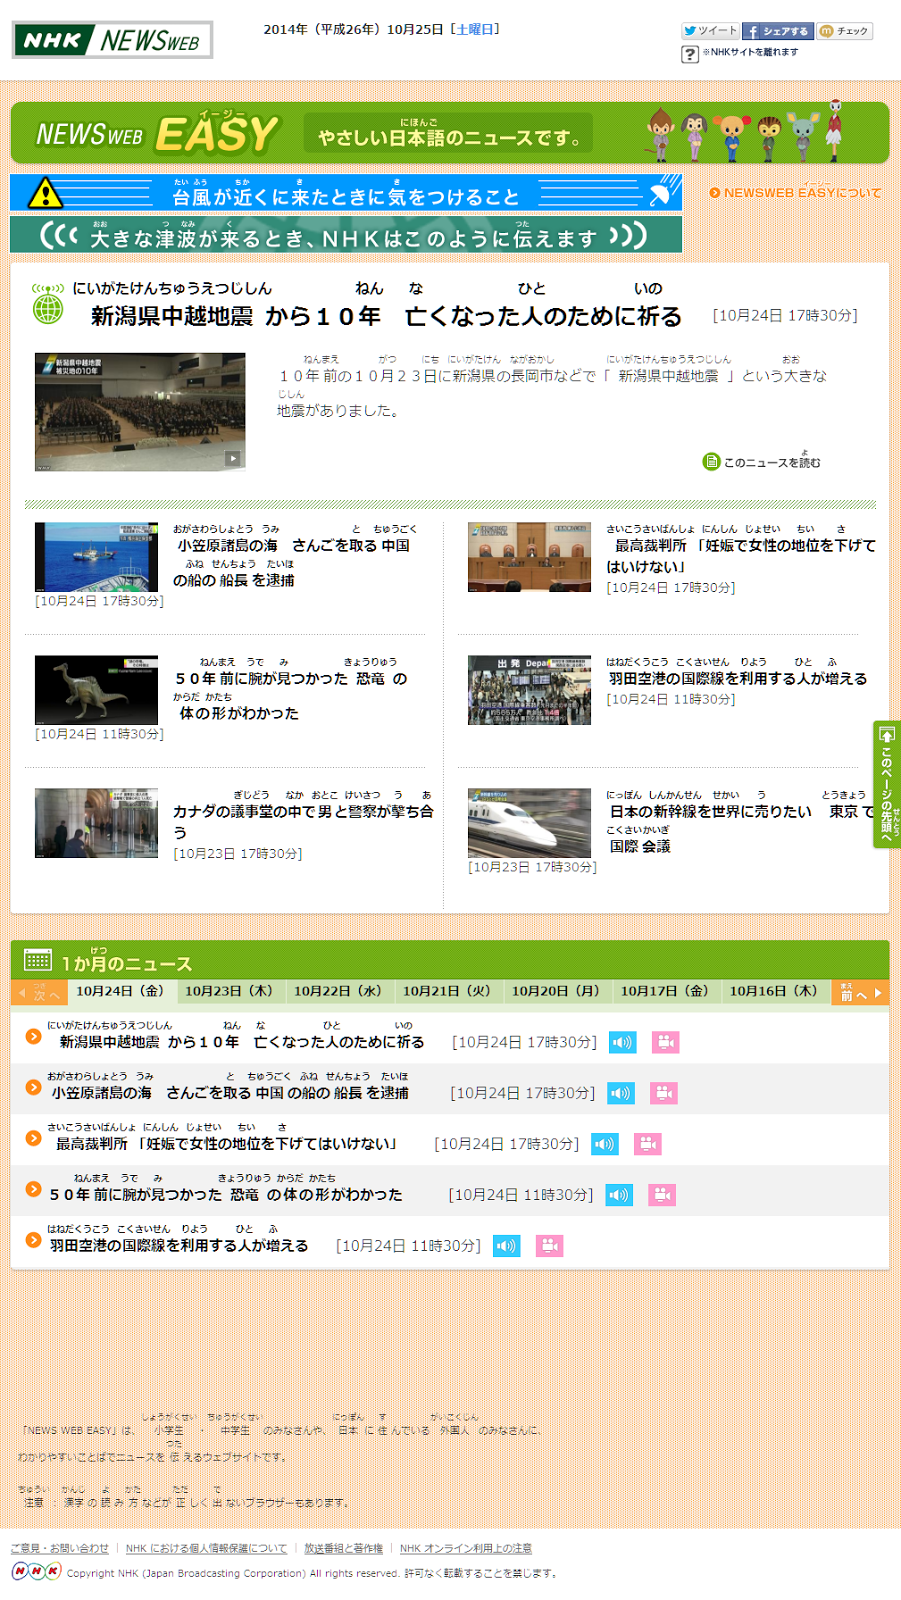 news web easy image